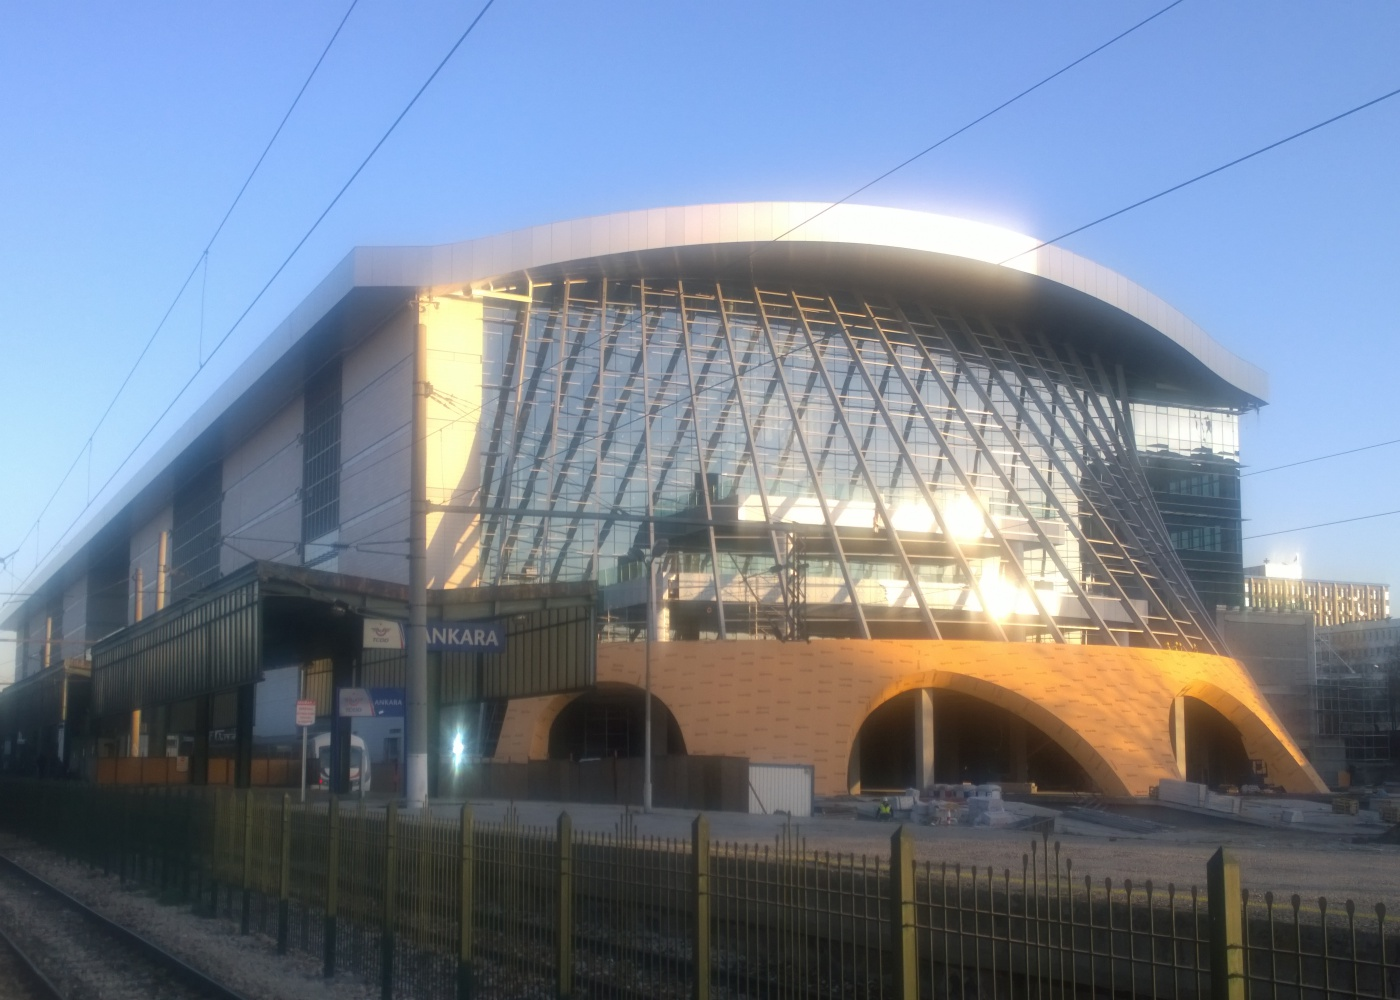 Ankara high speed train station